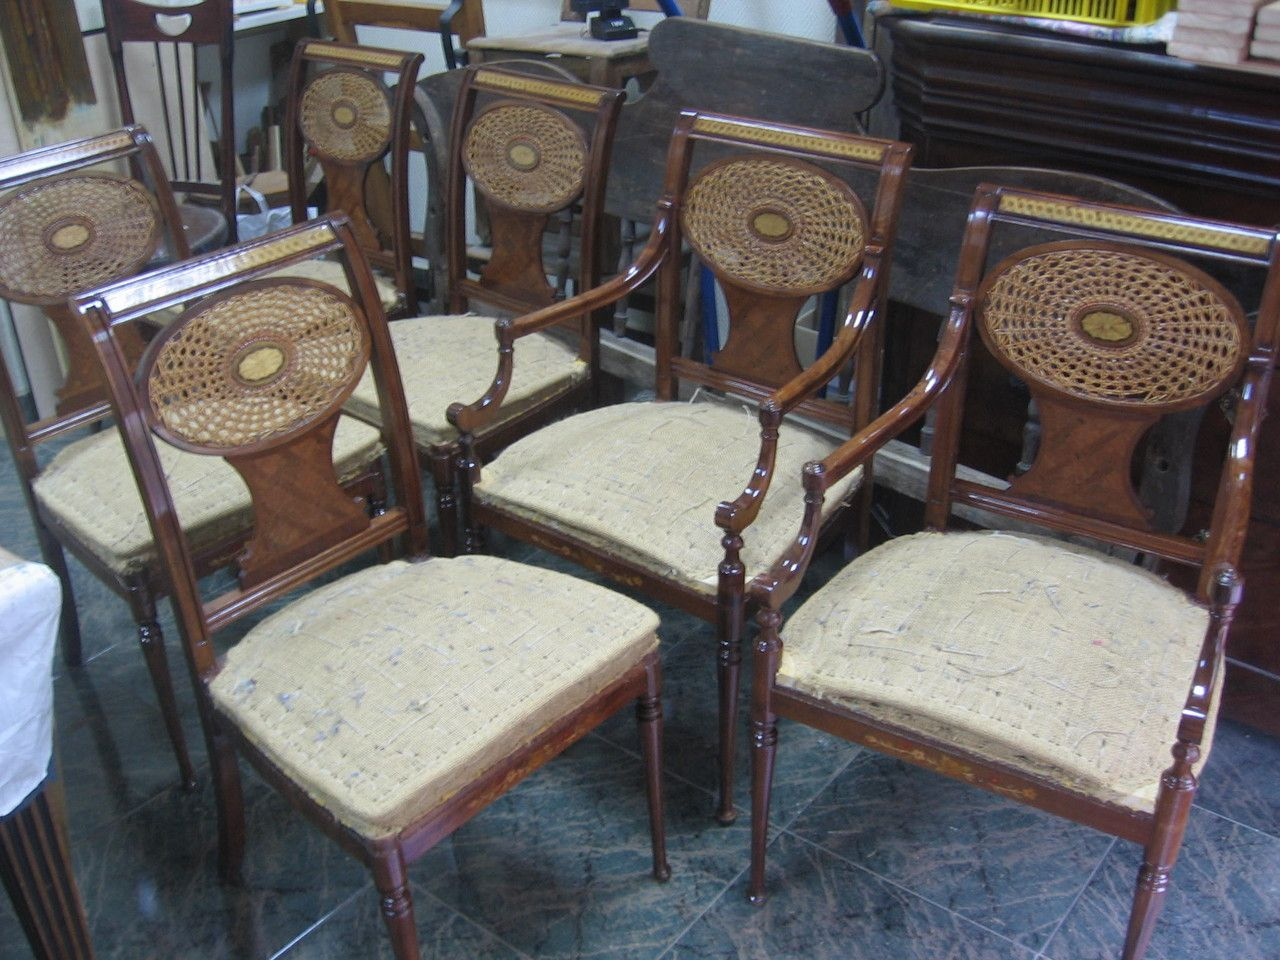 Sillas Sheraton Sillas Restauraci N De Muebles Pinterest  # Muebles Torres Y Gutierrez